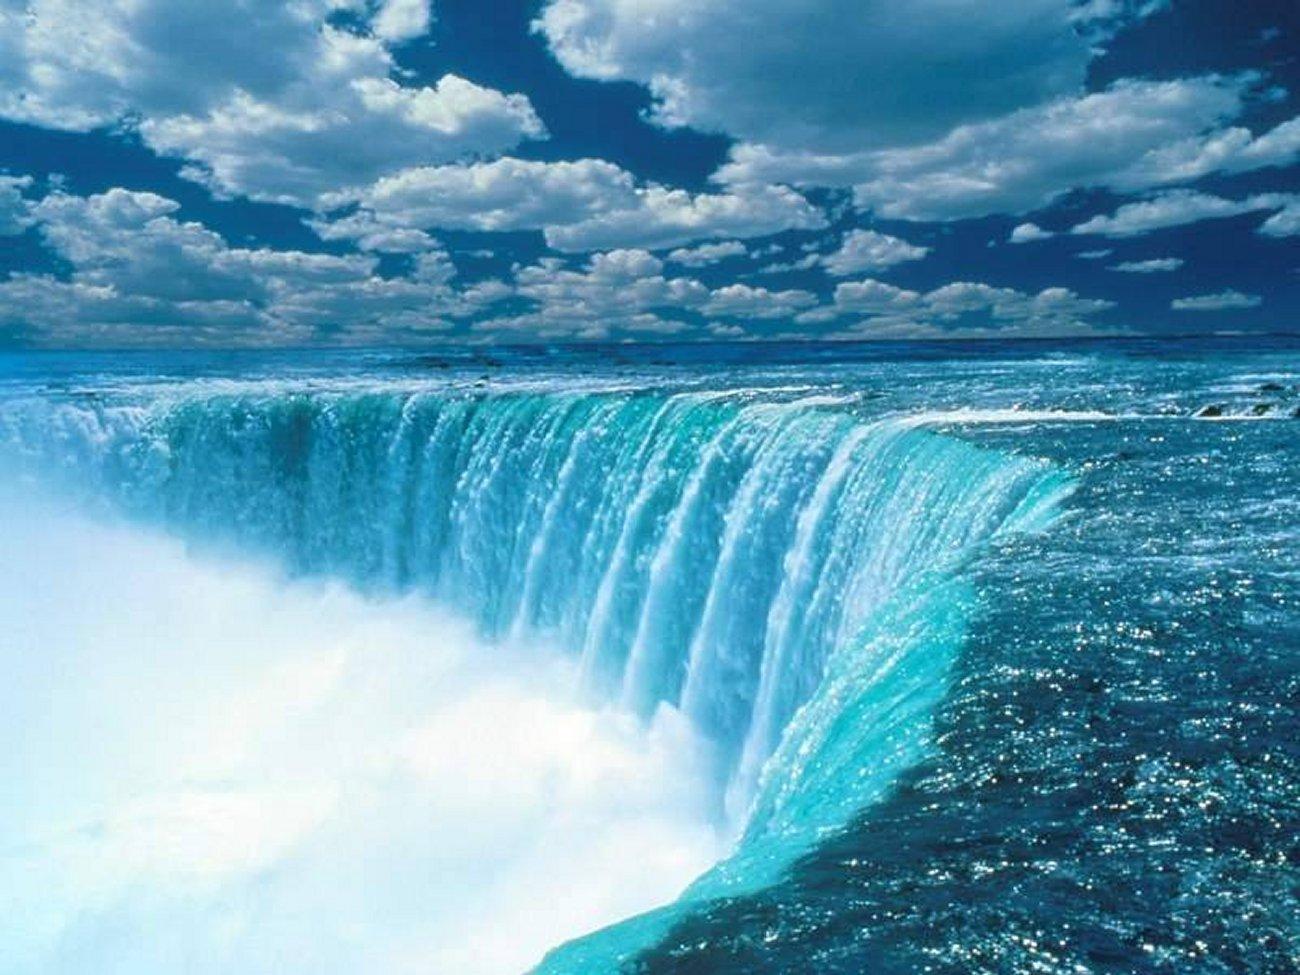 Niagara Falls HD Wallpapers HD Wallpapers 360 1300x975